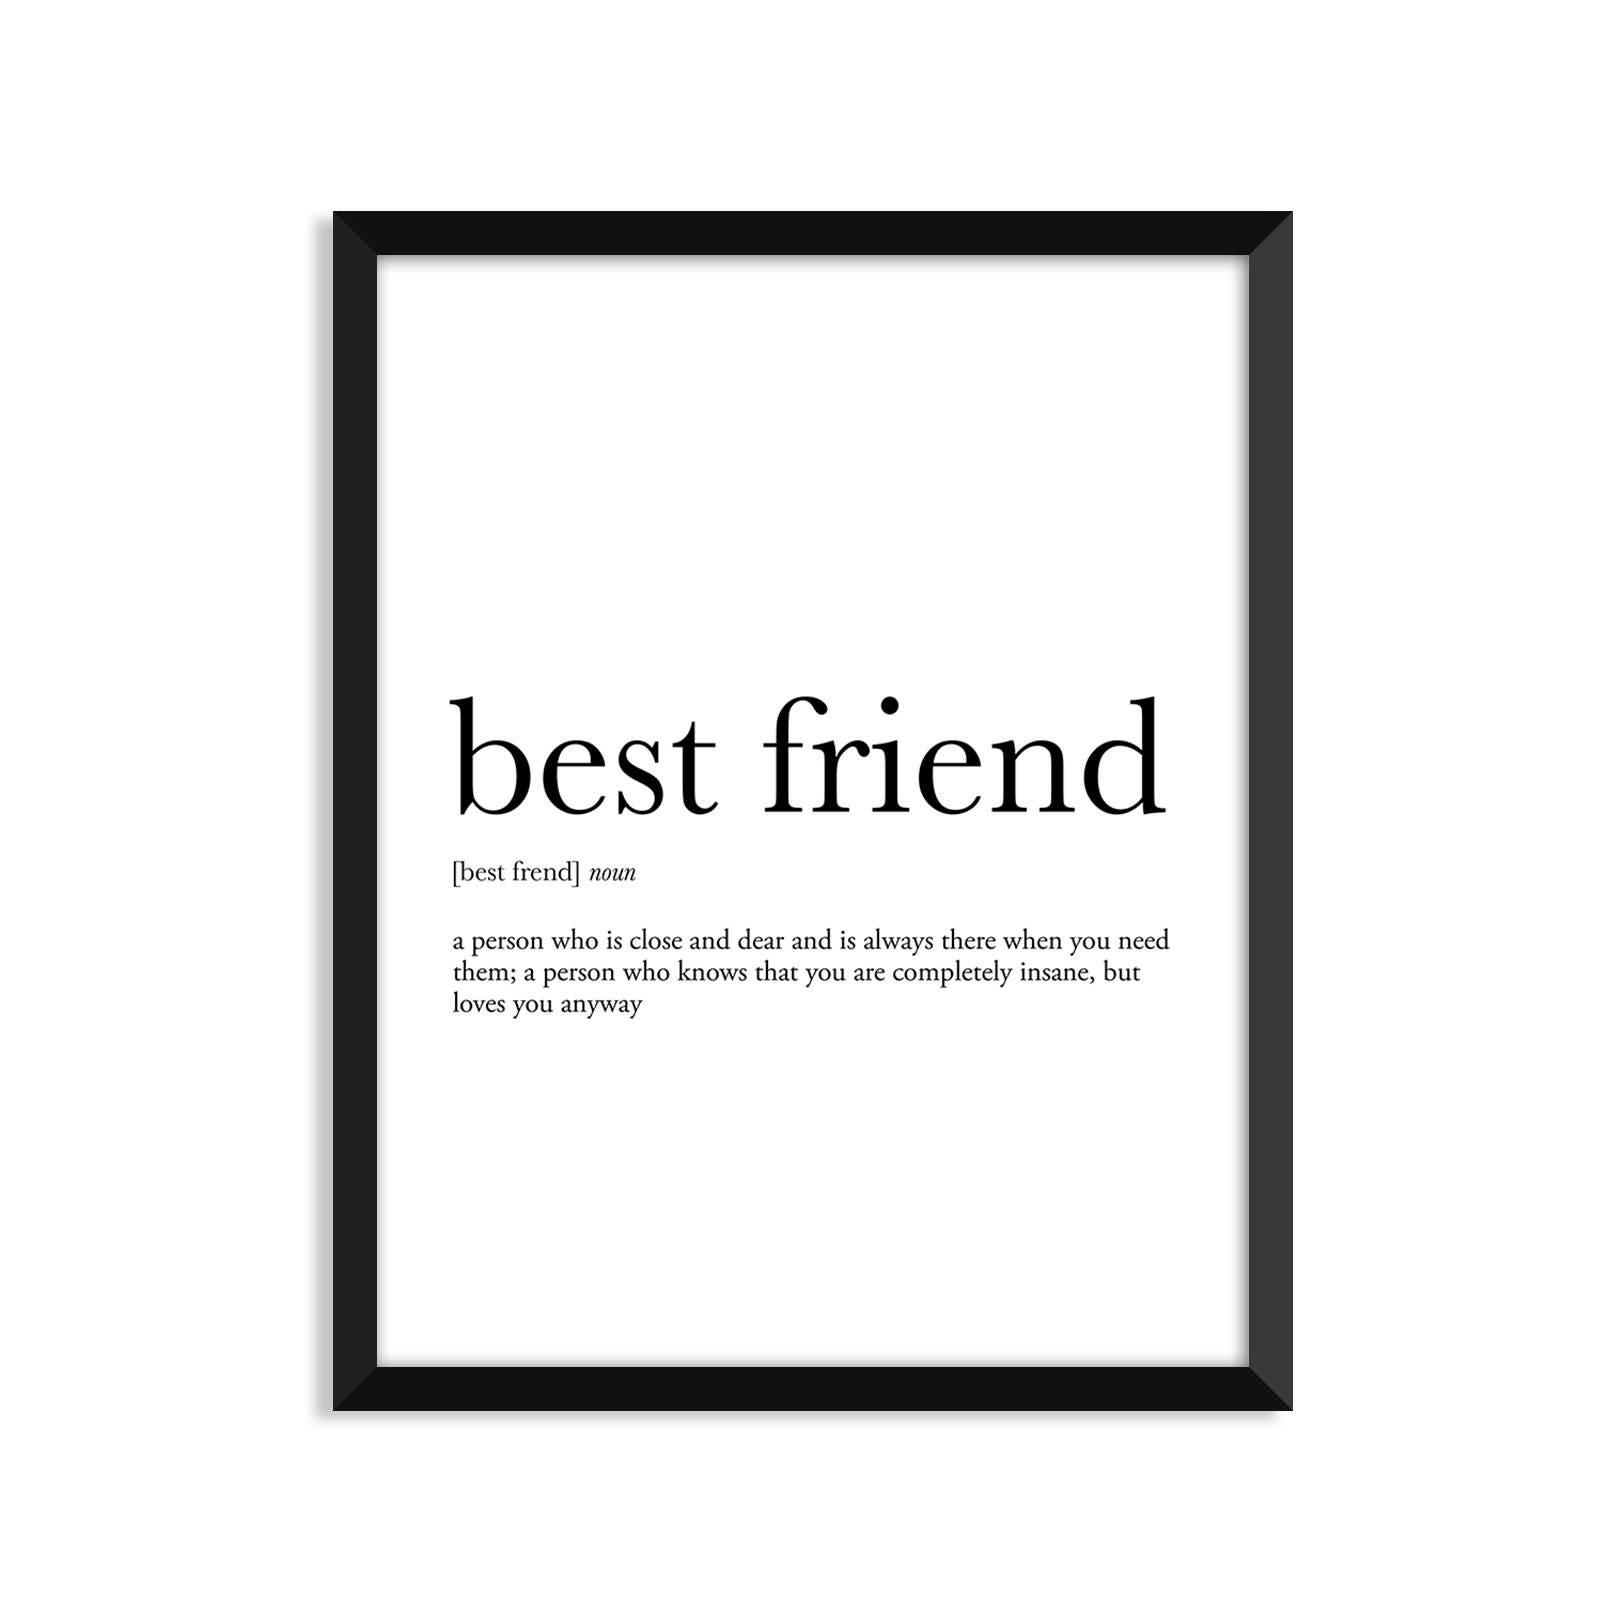 best friend definition romantic dictionary art print office | etsy